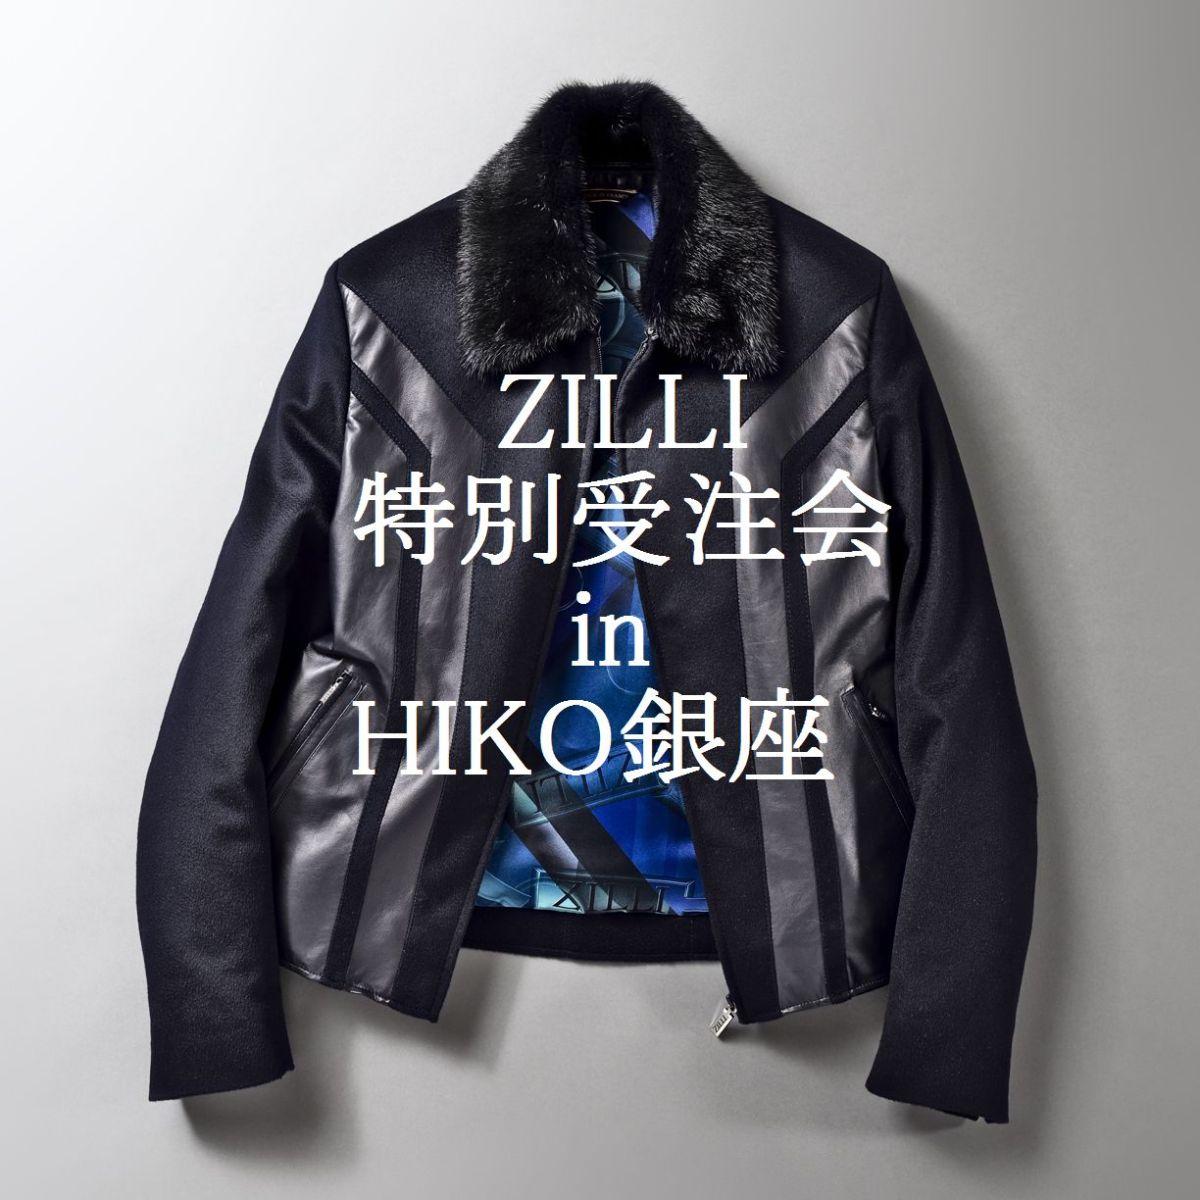 ZILLI特別受注会 in HIKO銀座